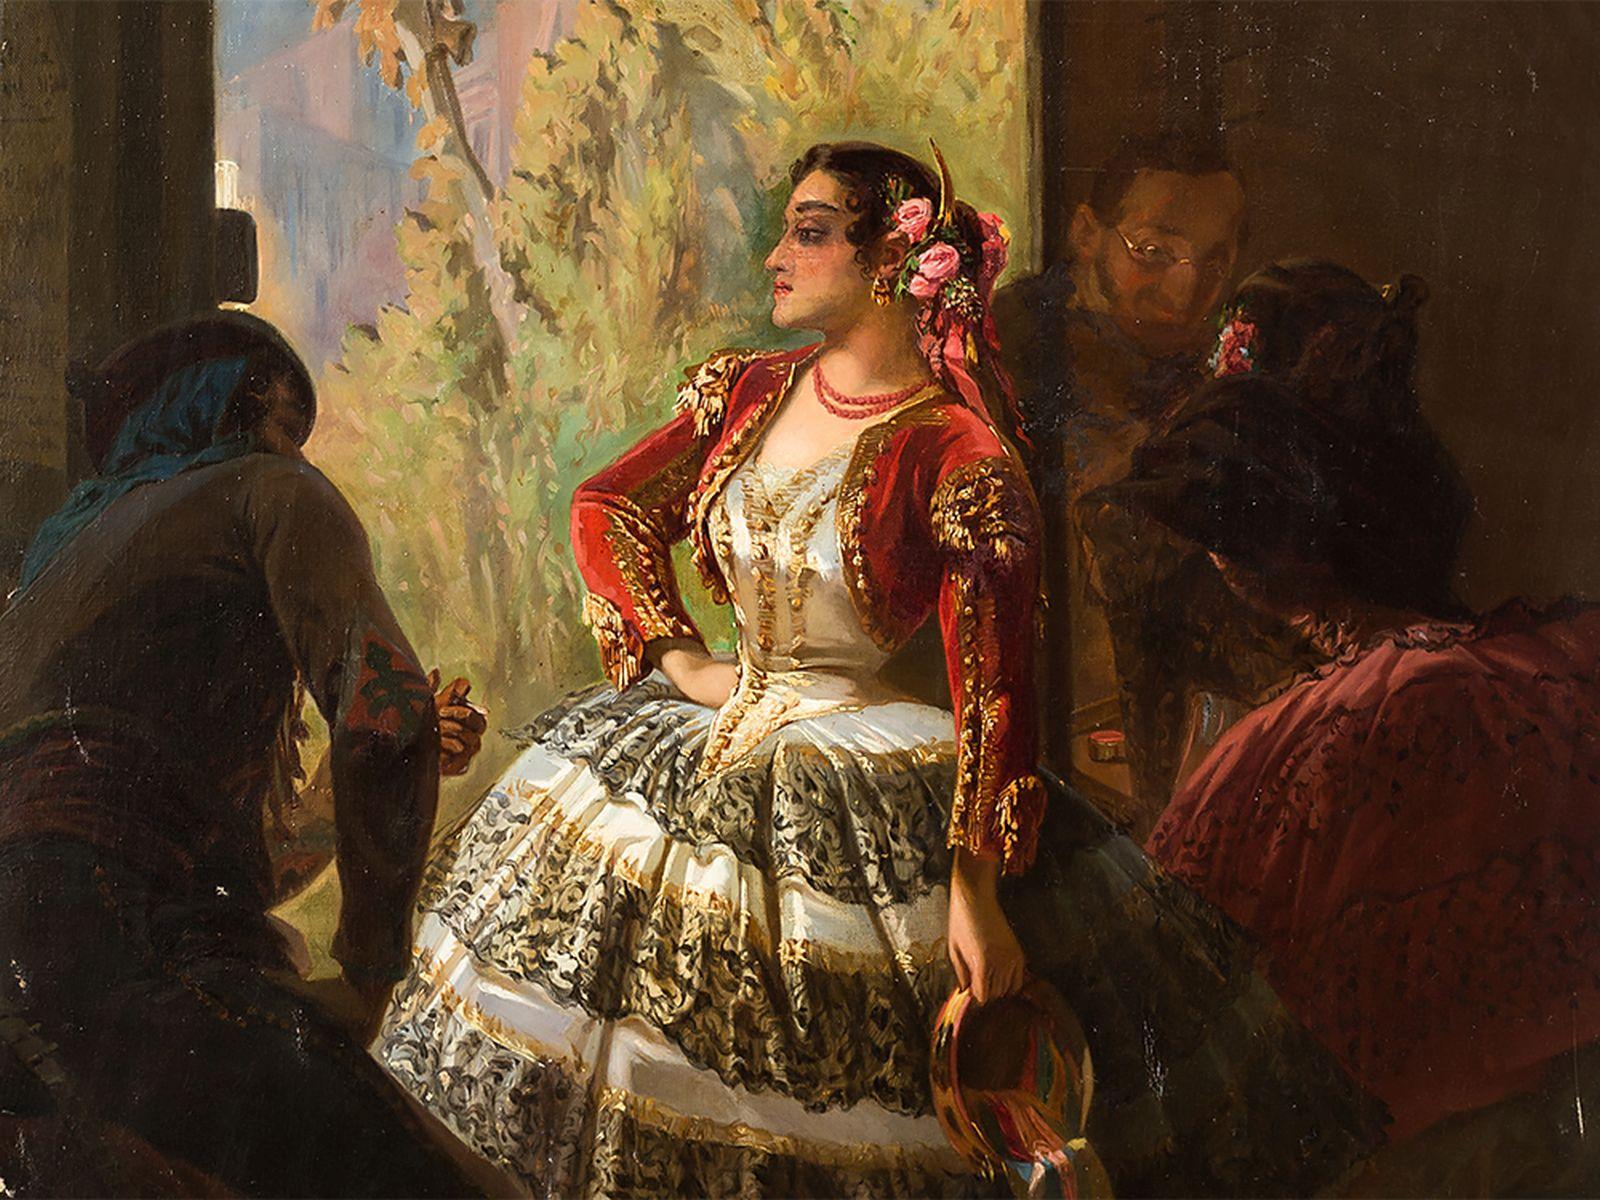 #15 Eugène Giraud (1806-1881), Spanish Dancer, Oil, 1886 |Eugène Giraud (1806-1881), Image